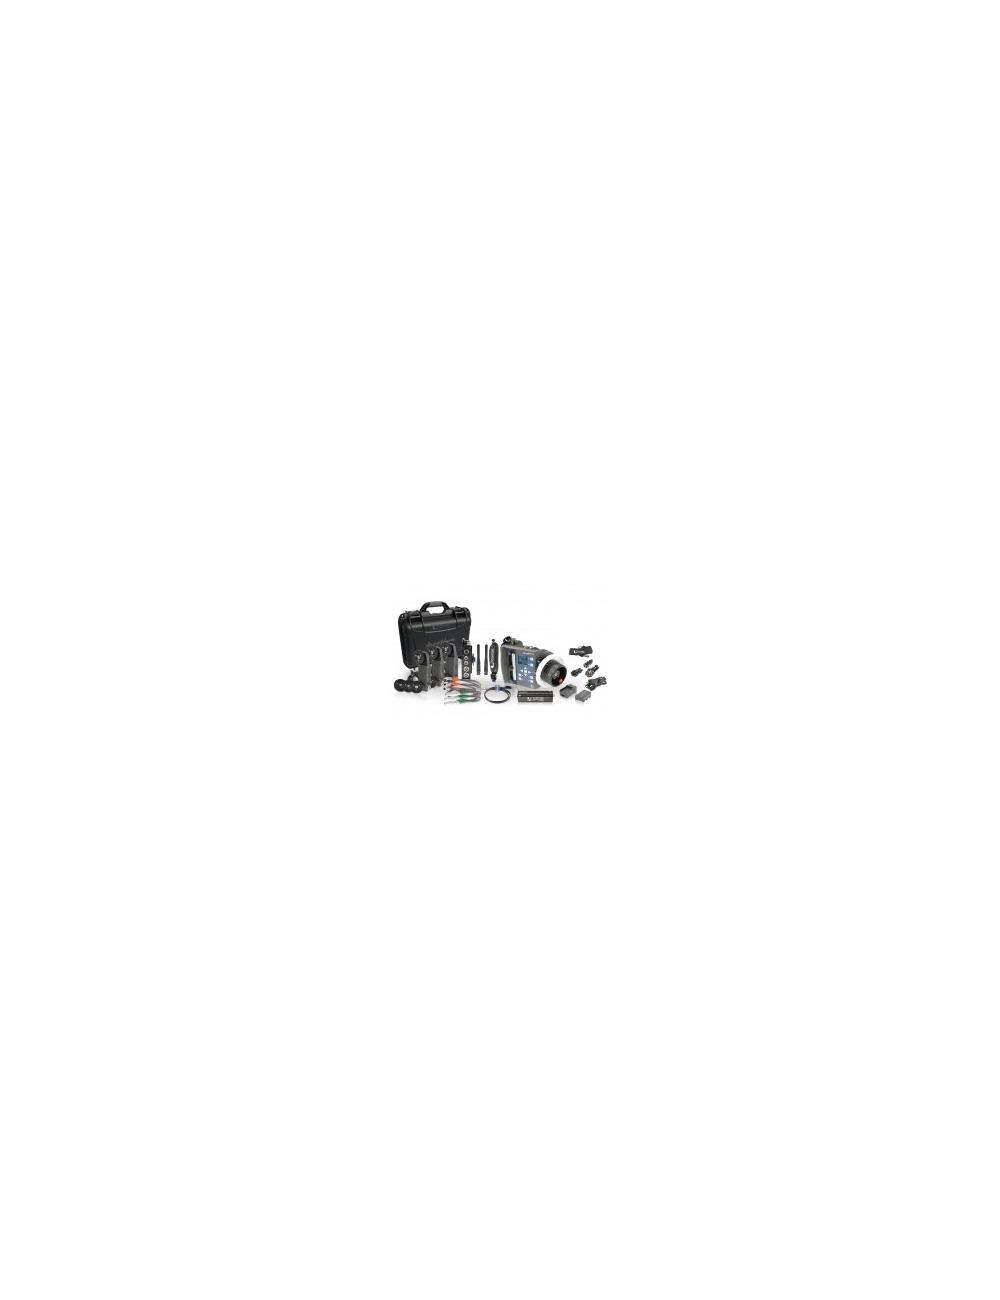 Chrosziel - Control inalámbrico MagNum (motor Heden) foco/iris/zoom/cámara MN300KITH